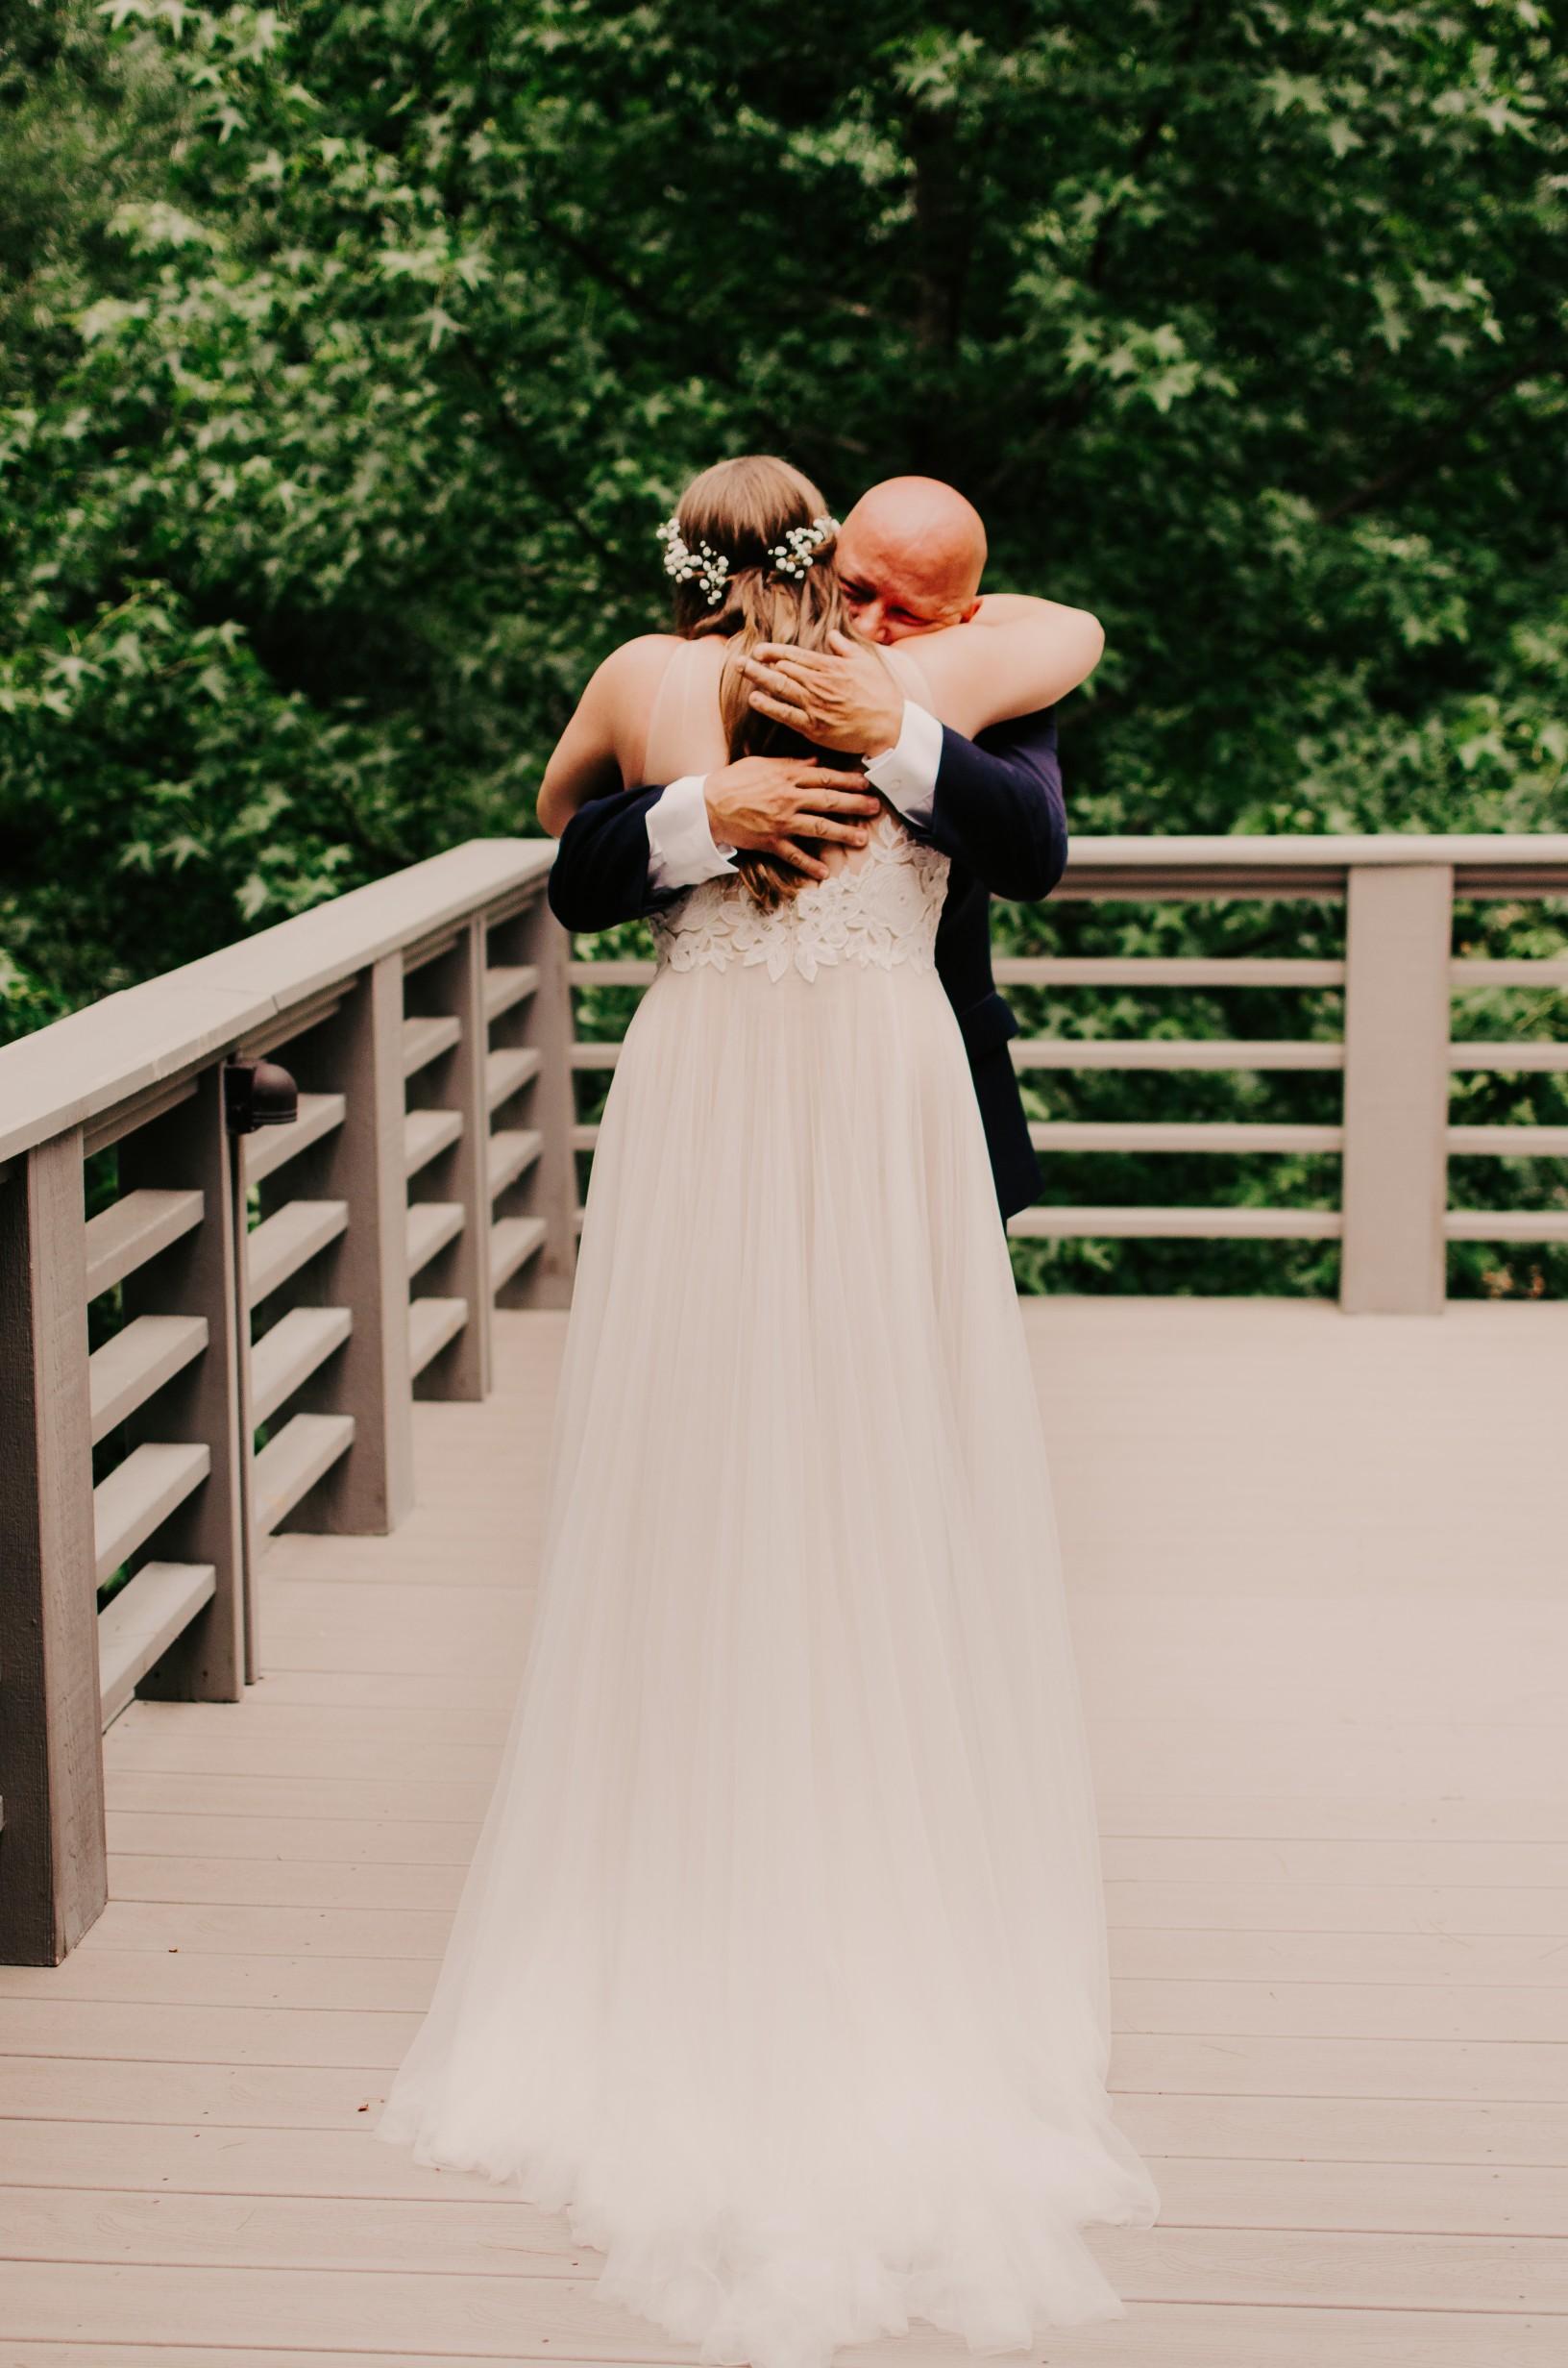 wedding-portrait-photos-first-look.jpg.